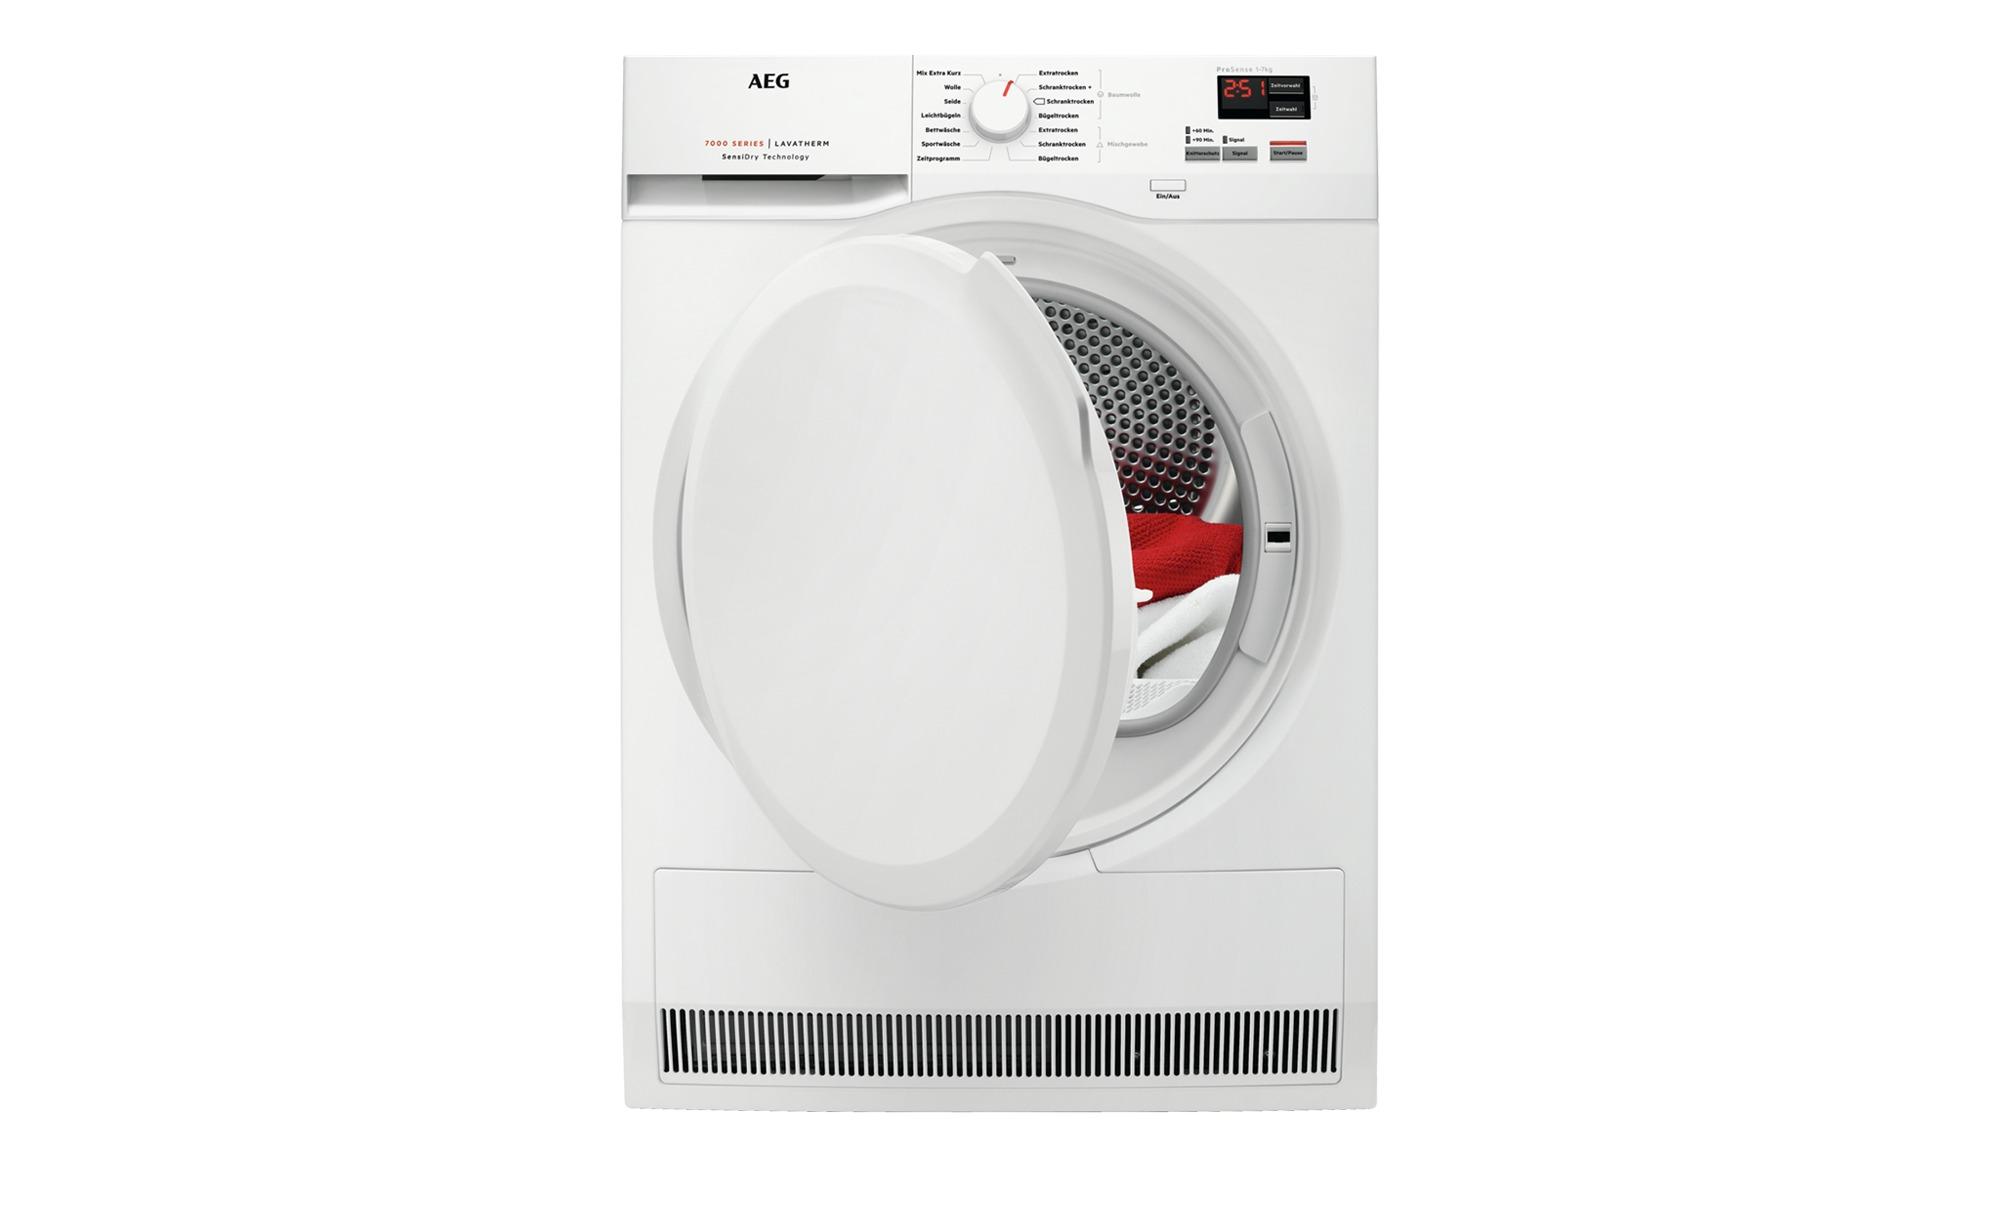 AEG Wärmepumpentrockner  T7DB40470 - weiß - Metall-lackiert, Kunststoff - 60 cm - 85 cm - 66,5 cm - Elektrogeräte > Trockner - Möbel Kraft   Bad > Waschmaschinen und Trockner > Wärmepumpentrockner   AEG